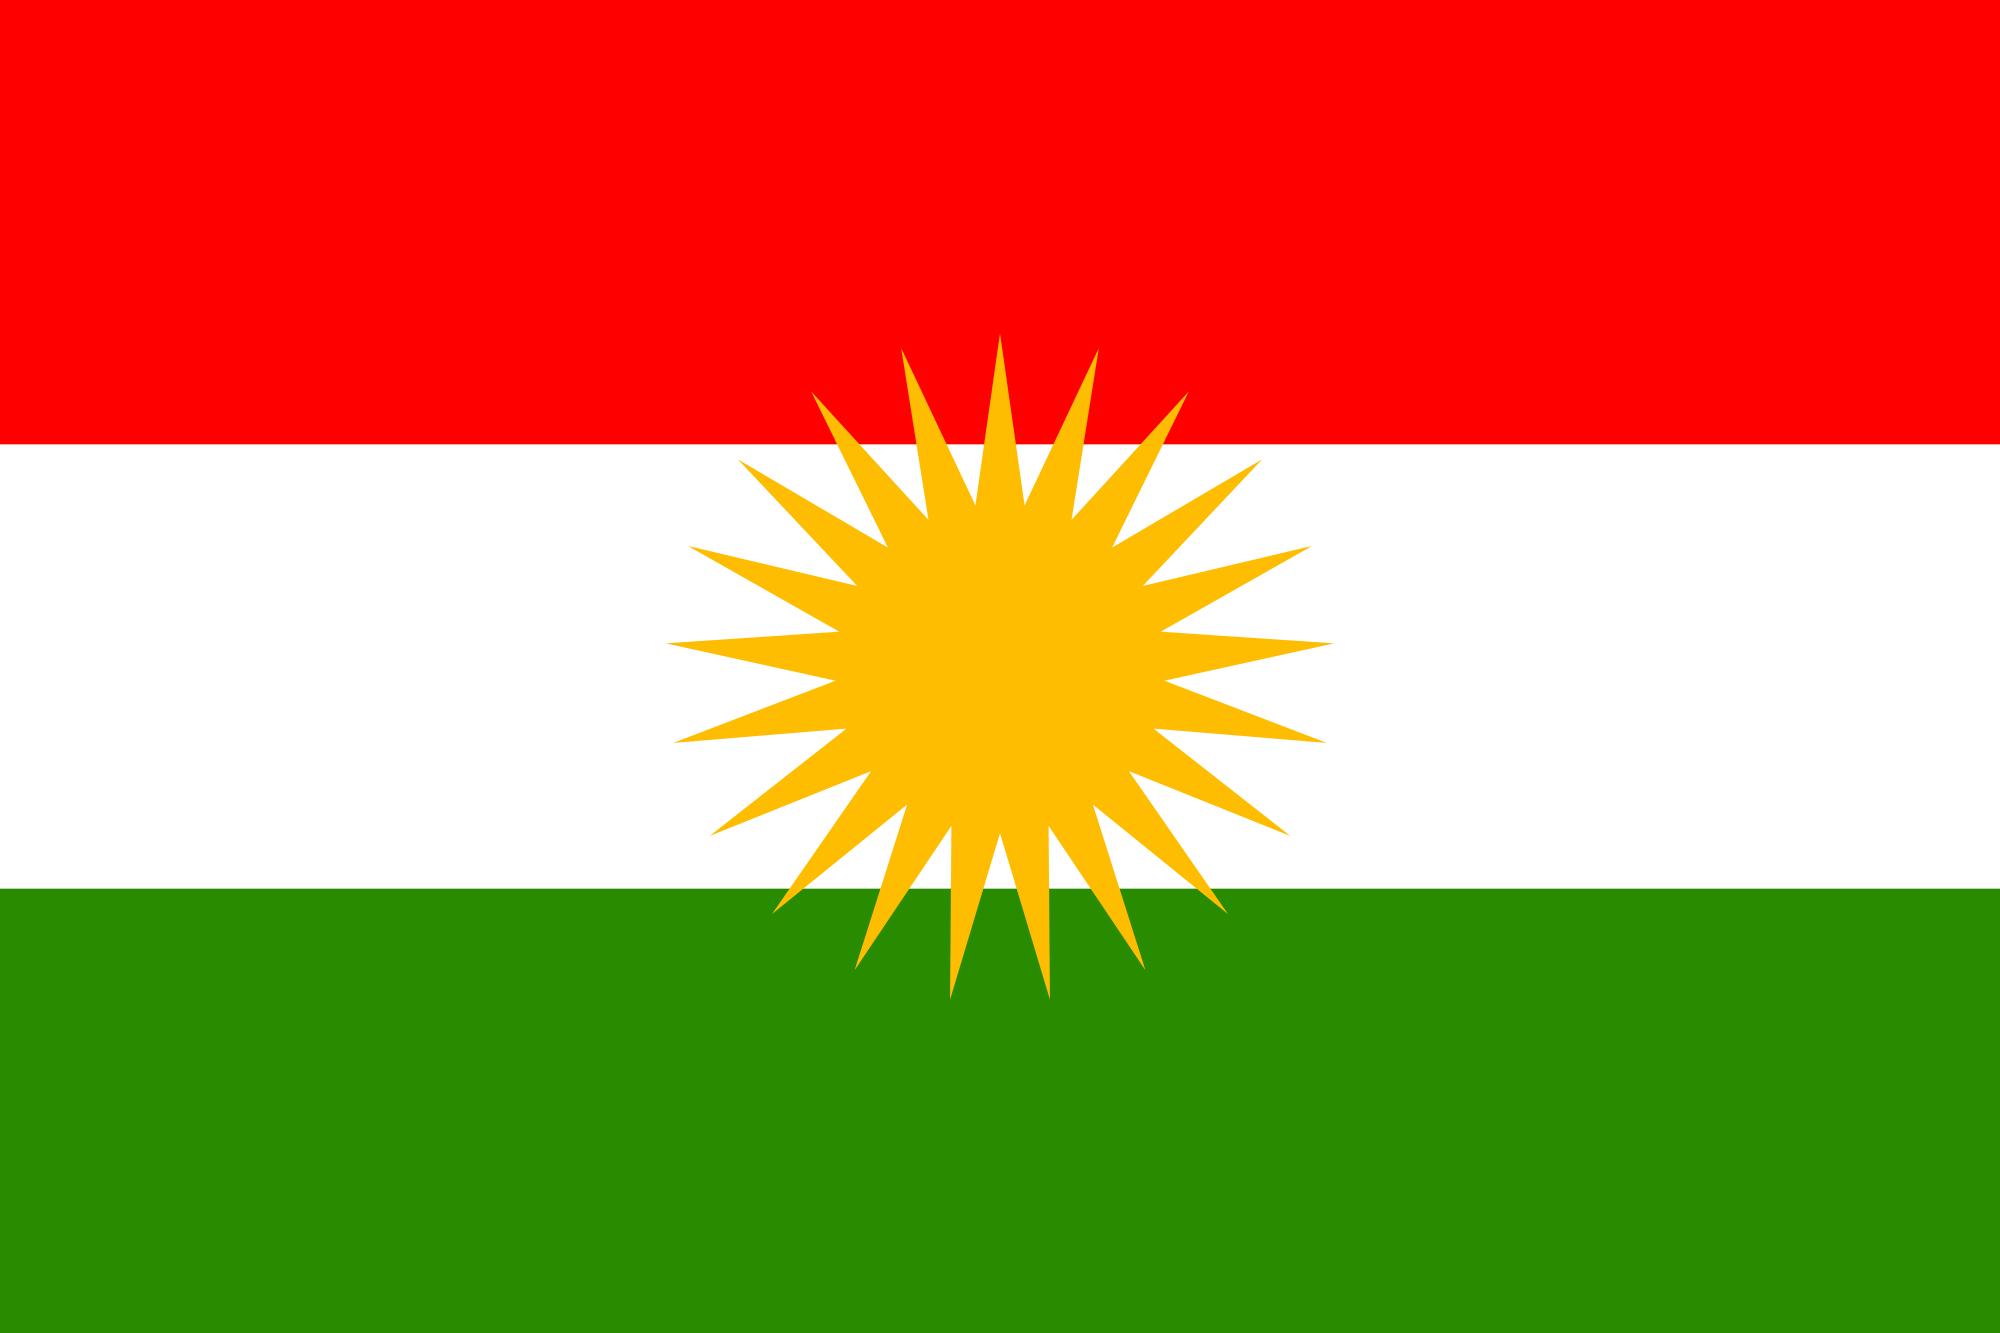 traducción-kurdo